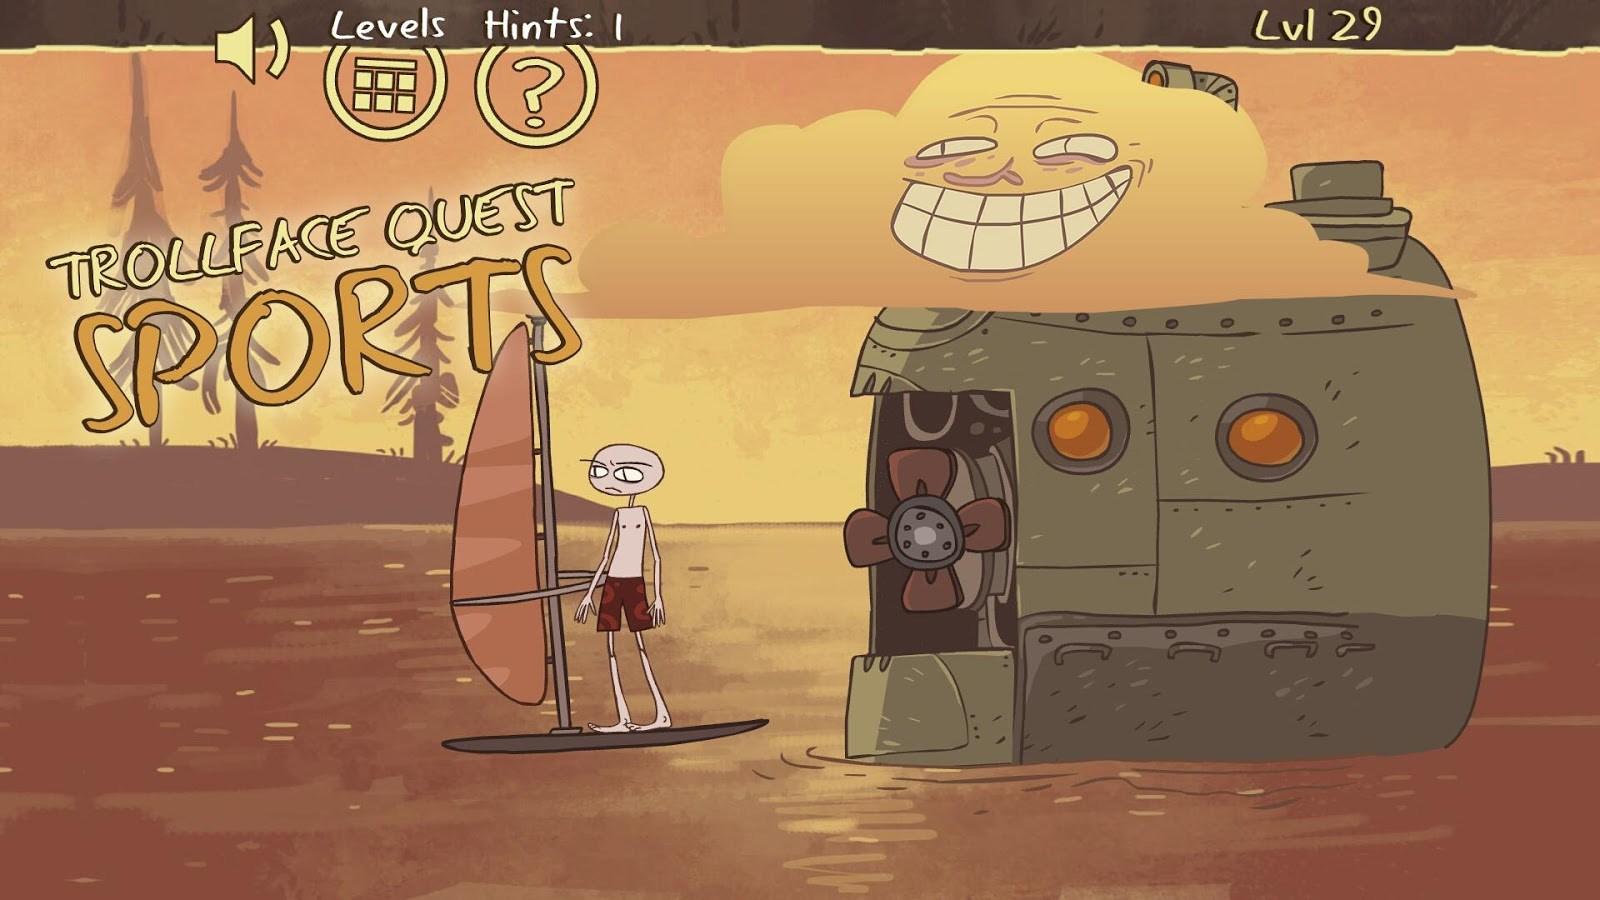 Troll face Quest Sports Puzzle - Imagem 1 do software